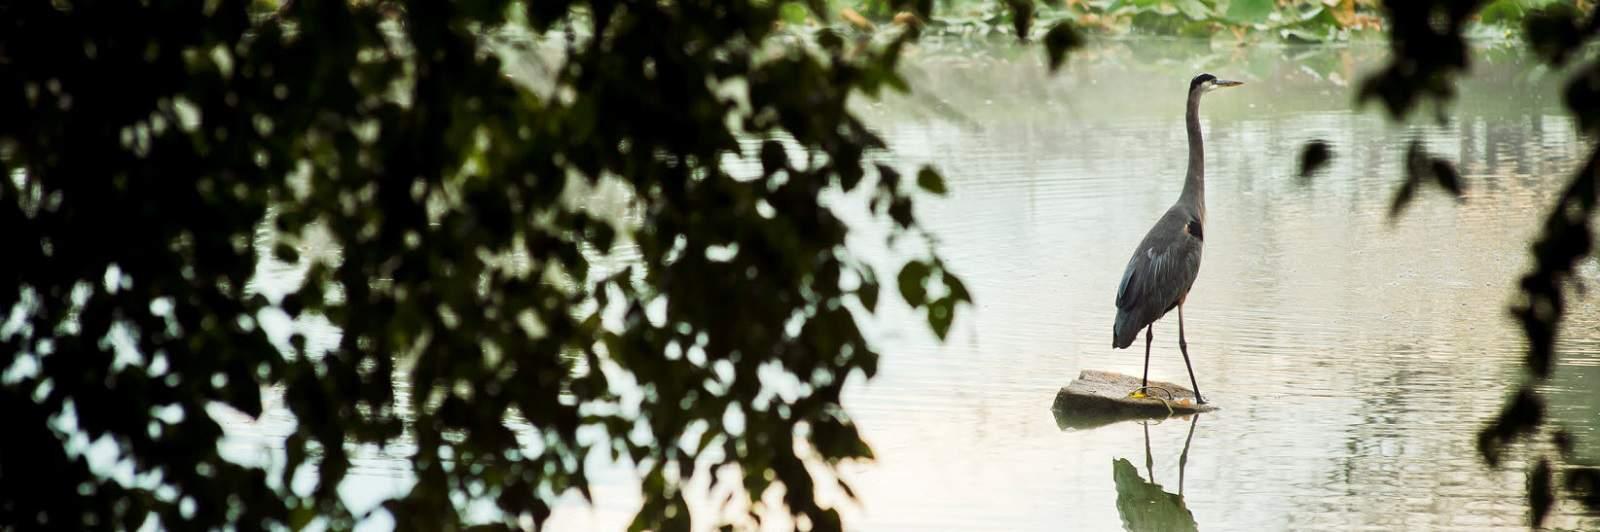 Blue Heron on community pond